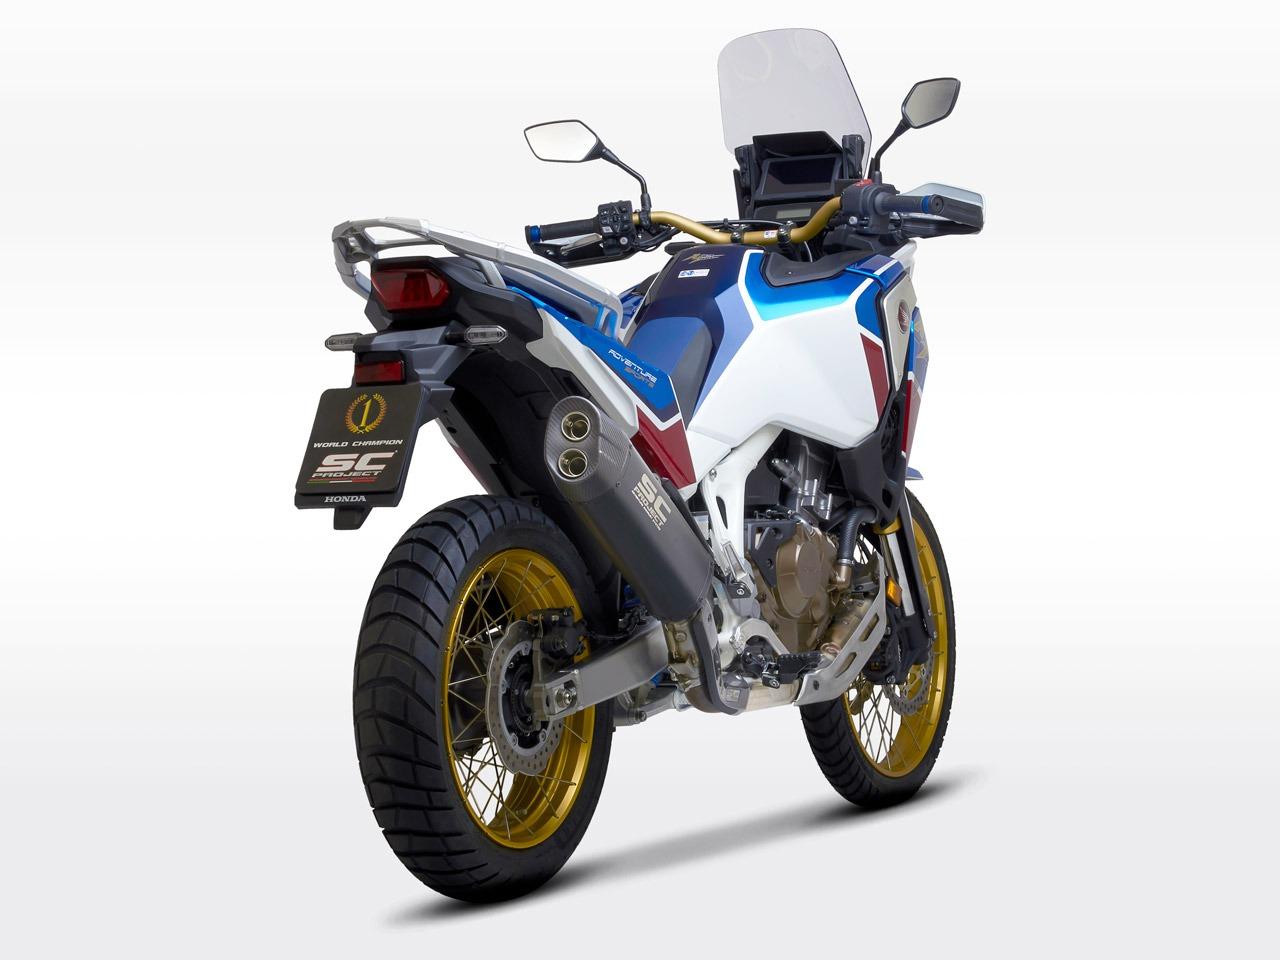 Honda_CRF1100L-AfricaTwin_my2021_Adventure-MattBlack_Posteriore_1280x960px_web-partnership